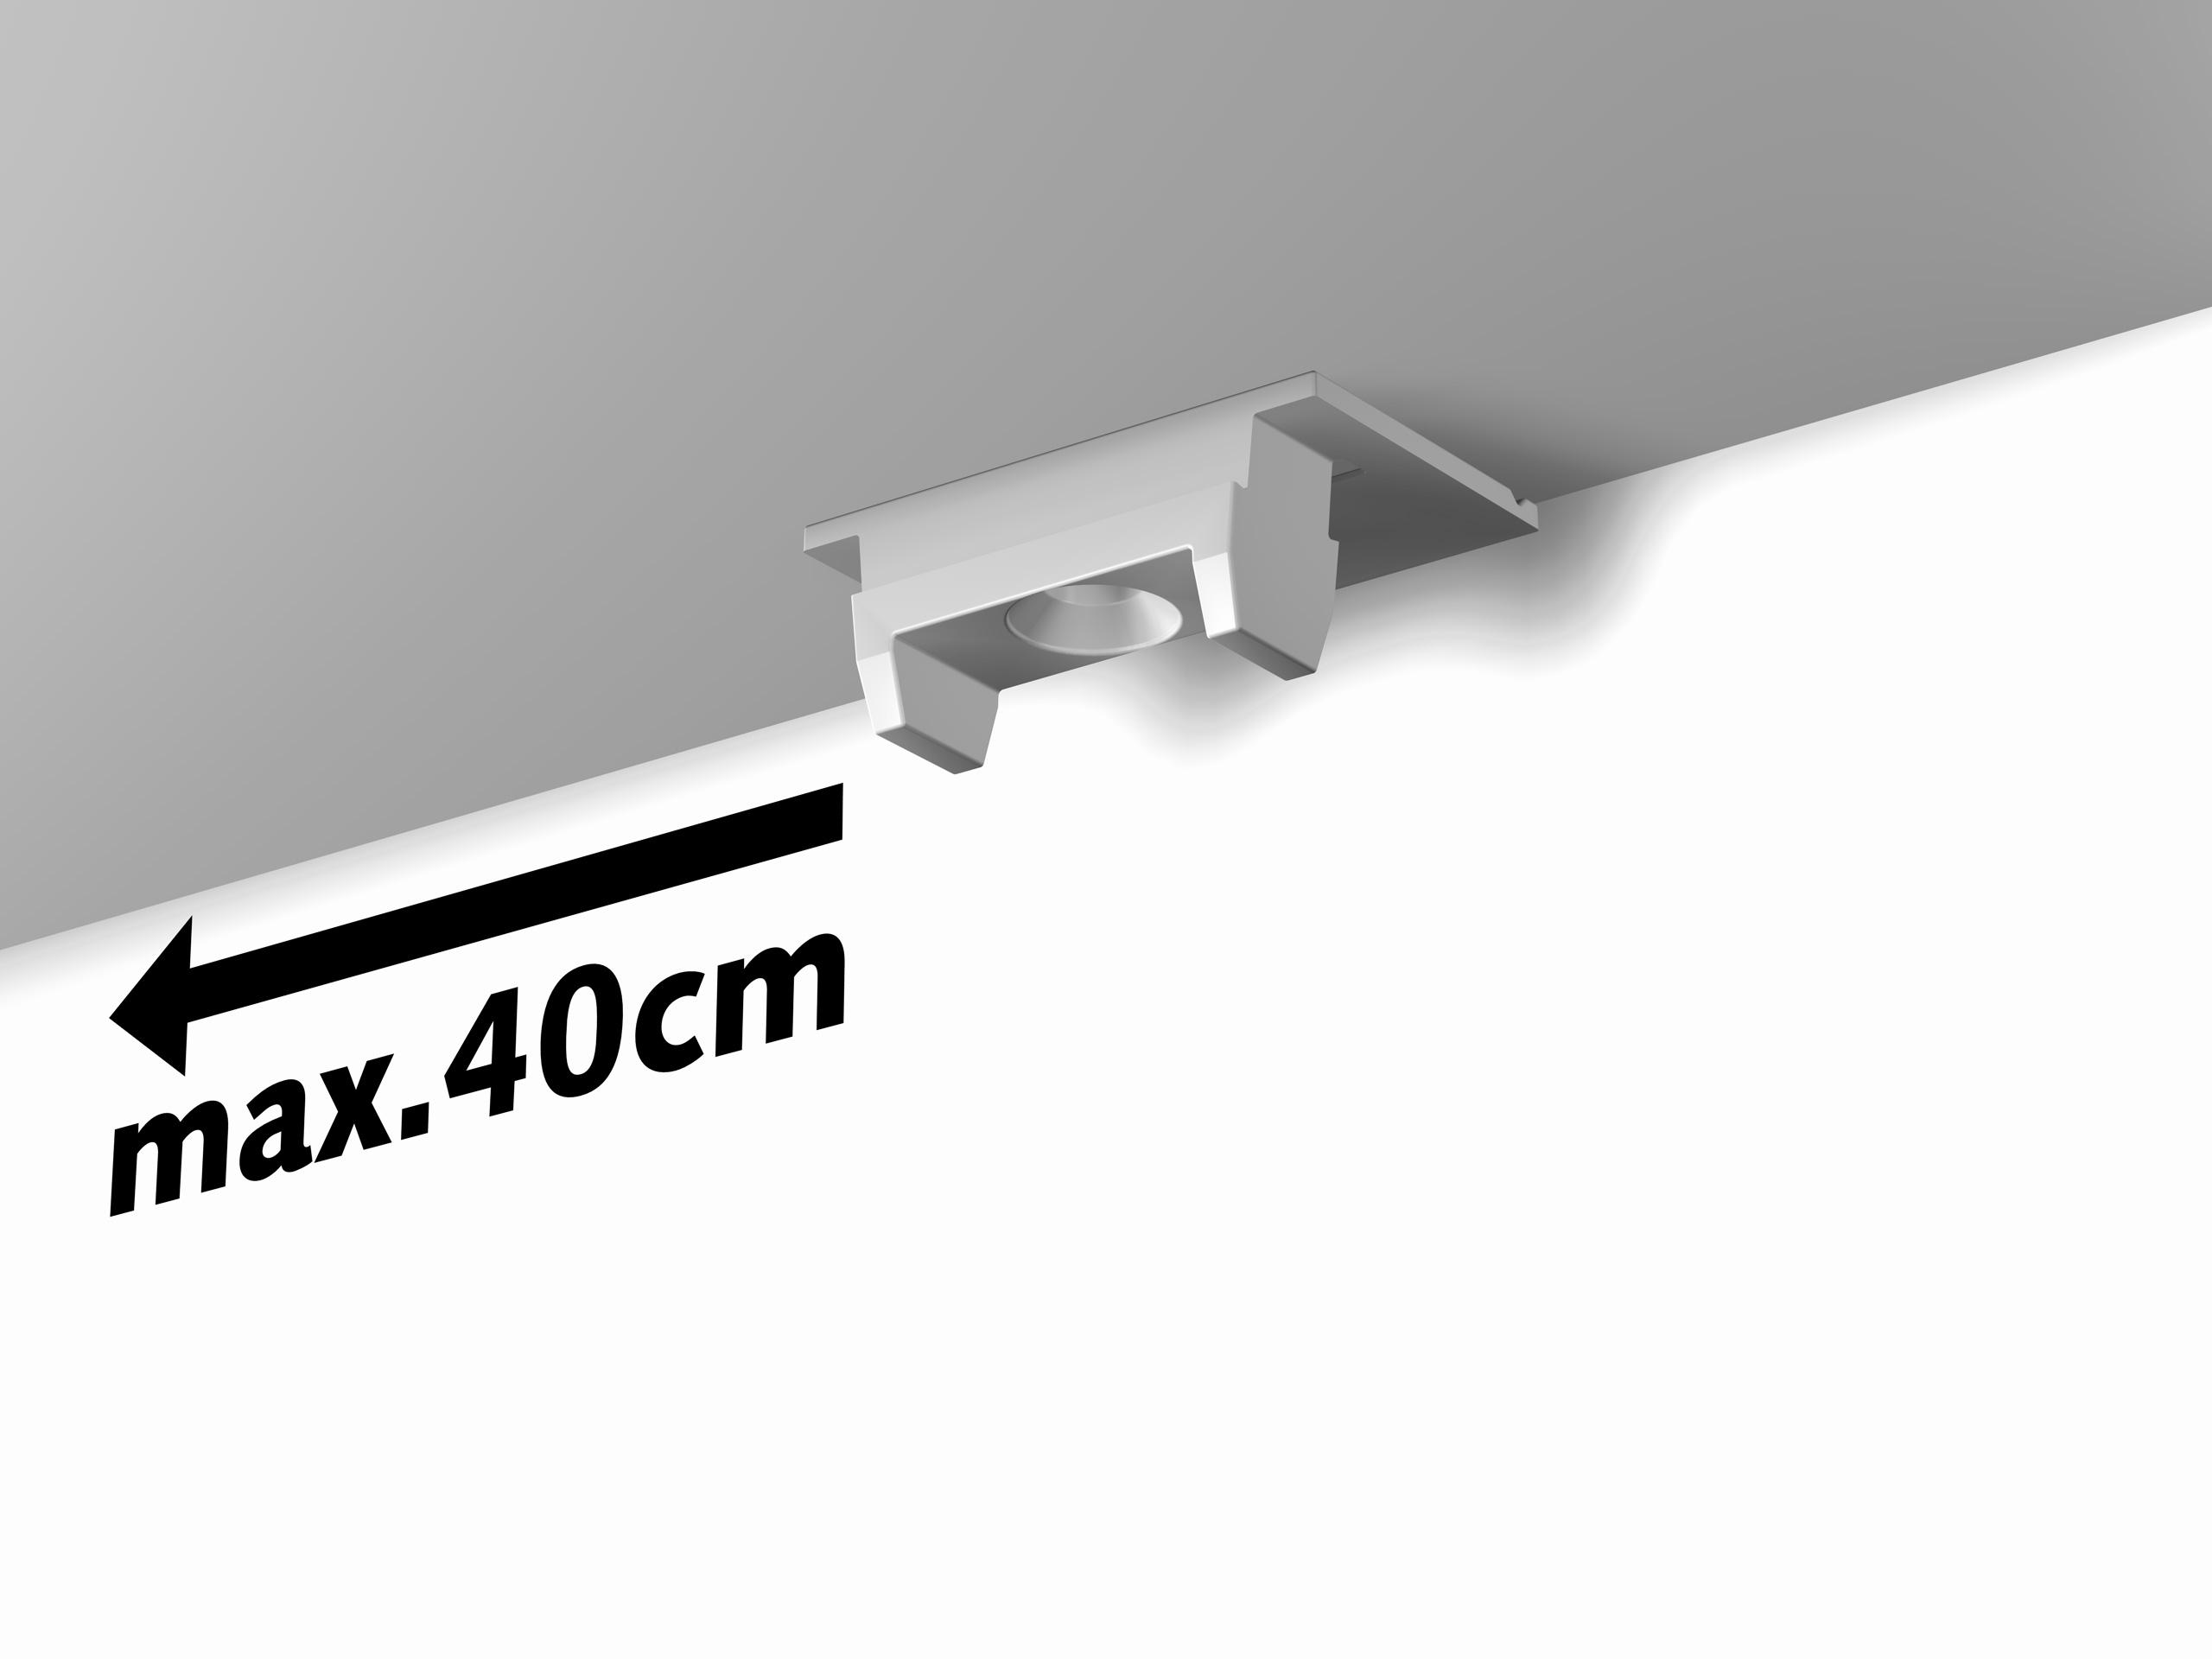 Clip-Abstand: maximal 40 cm